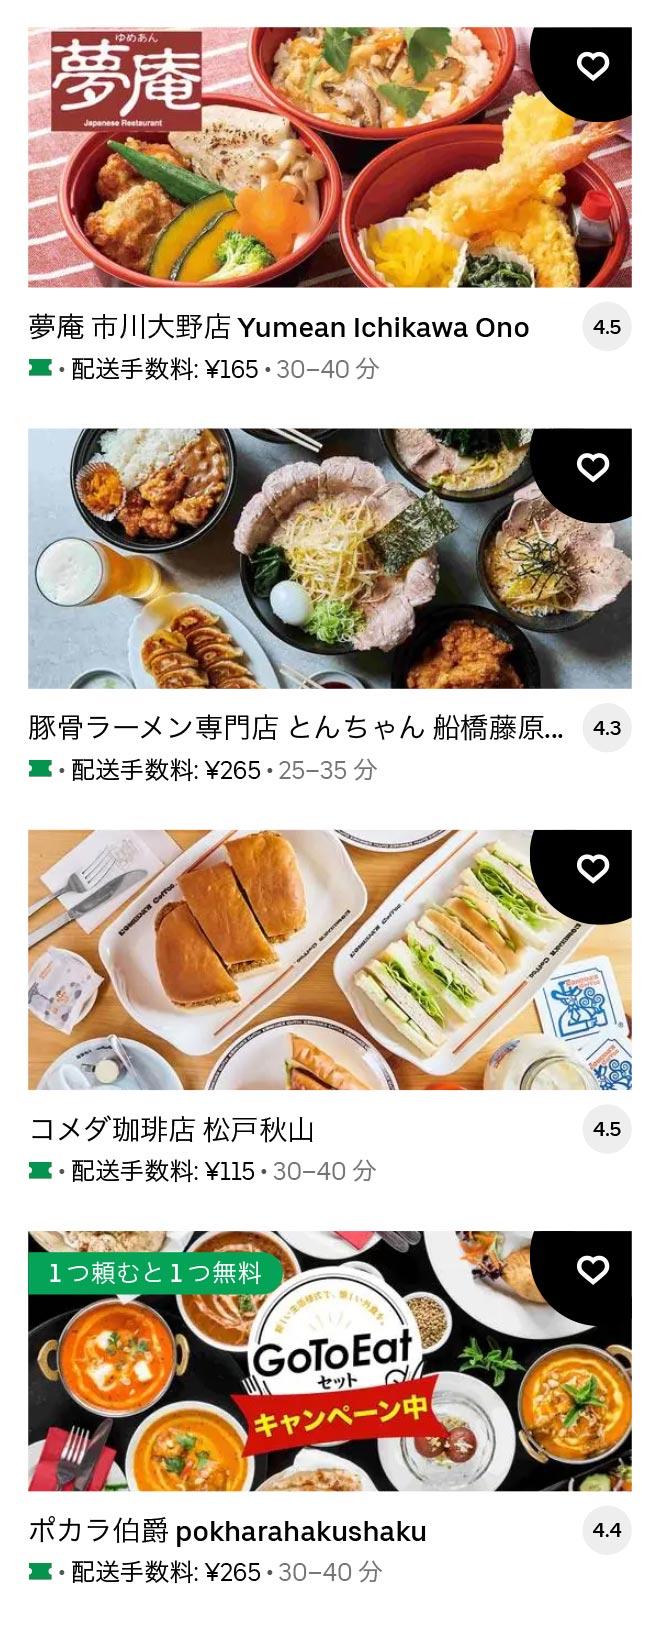 U ichikawa oono 2105 05